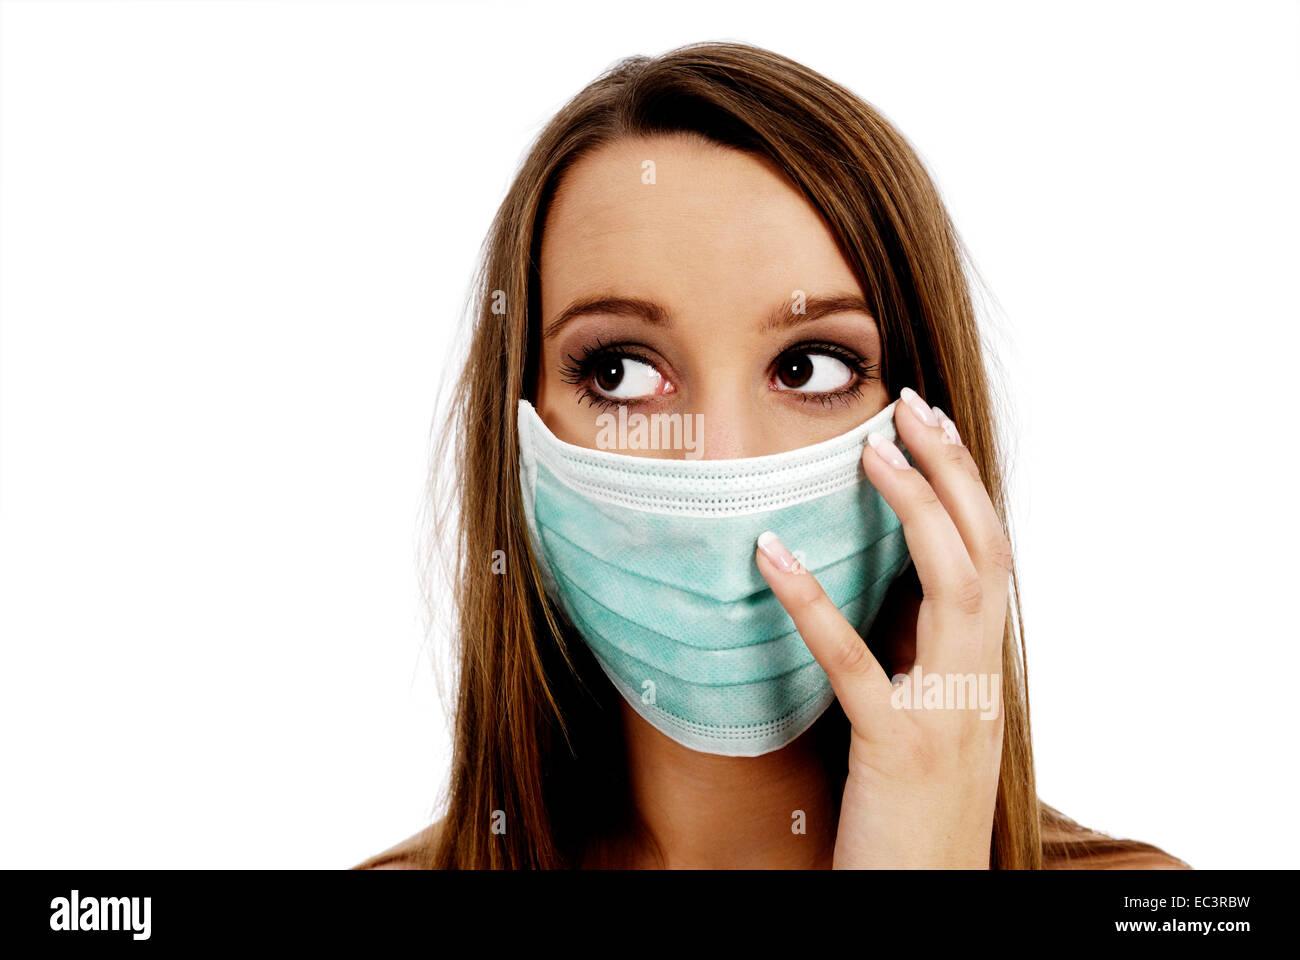 Woman with medical mask, swine influenza - Stock Image